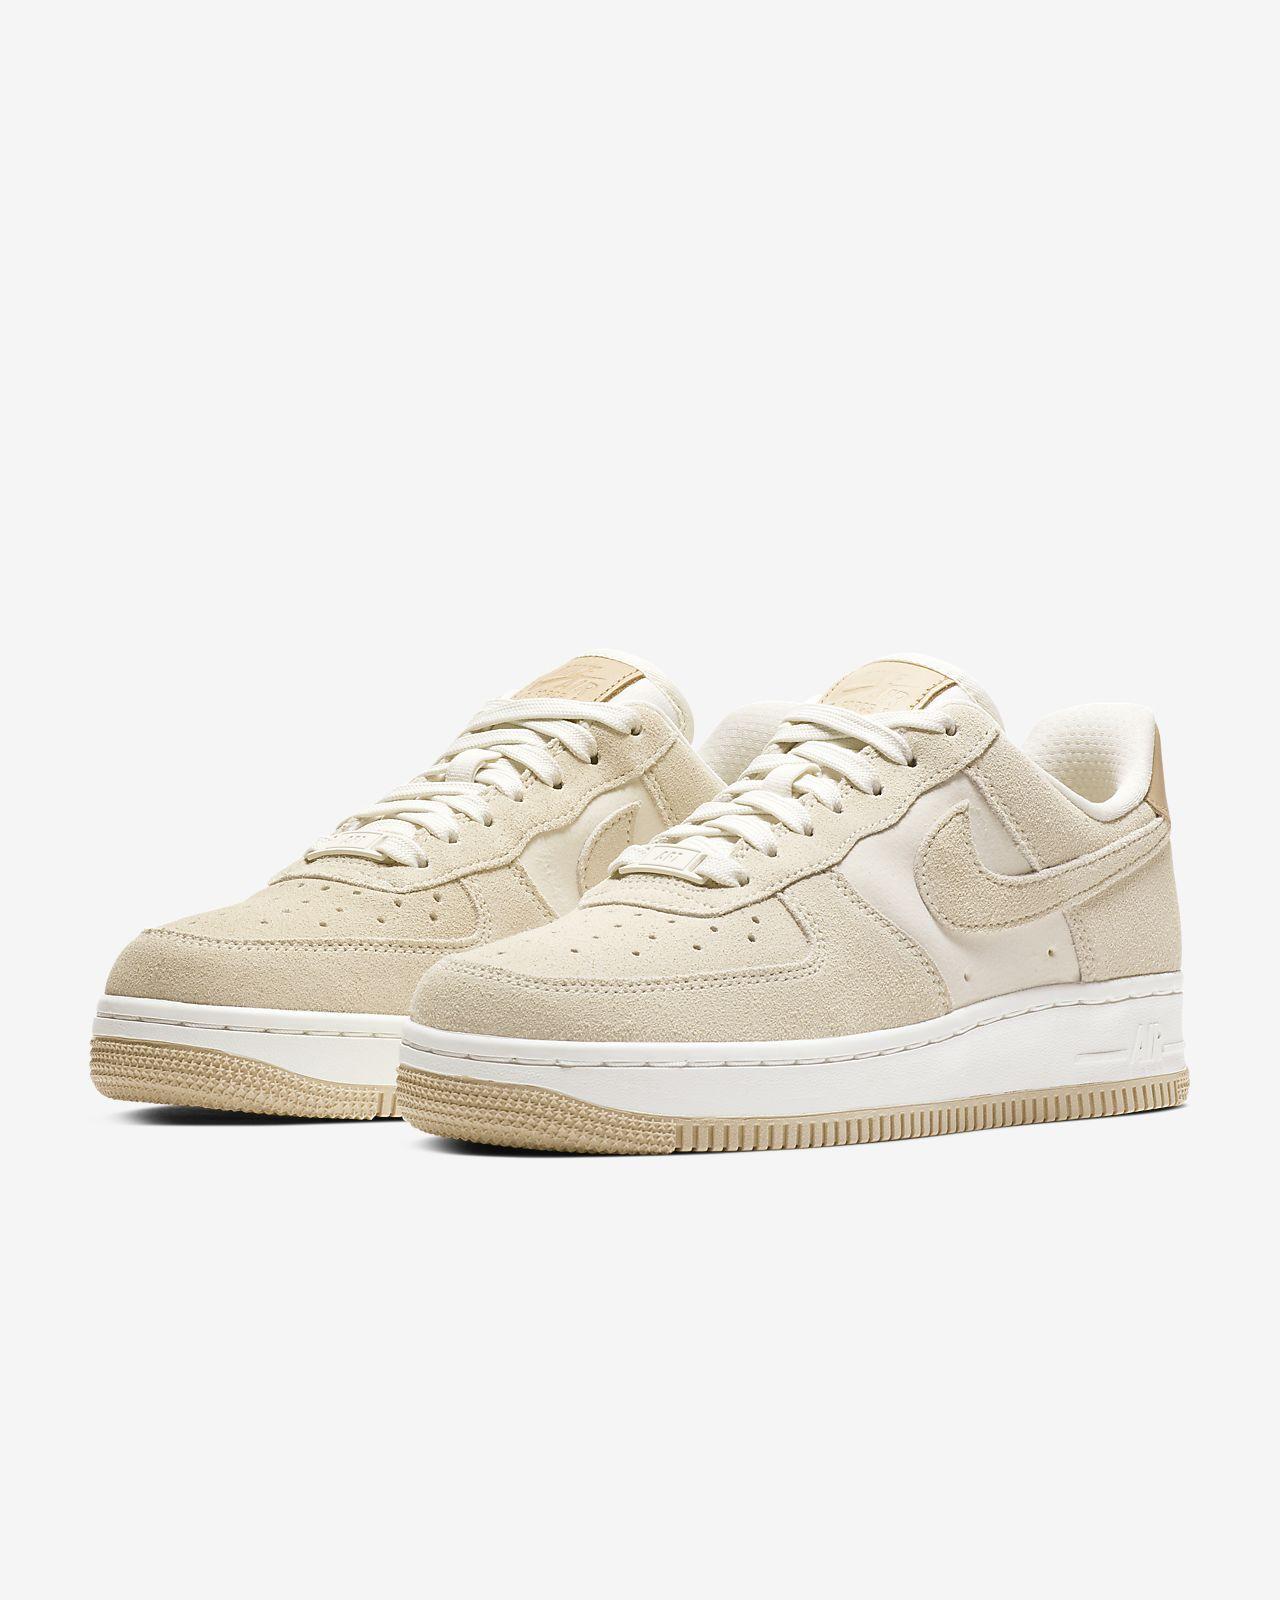 best service 1037f 1cb0c ... Nike Air Force 1  07 Low Premium Women s Shoe